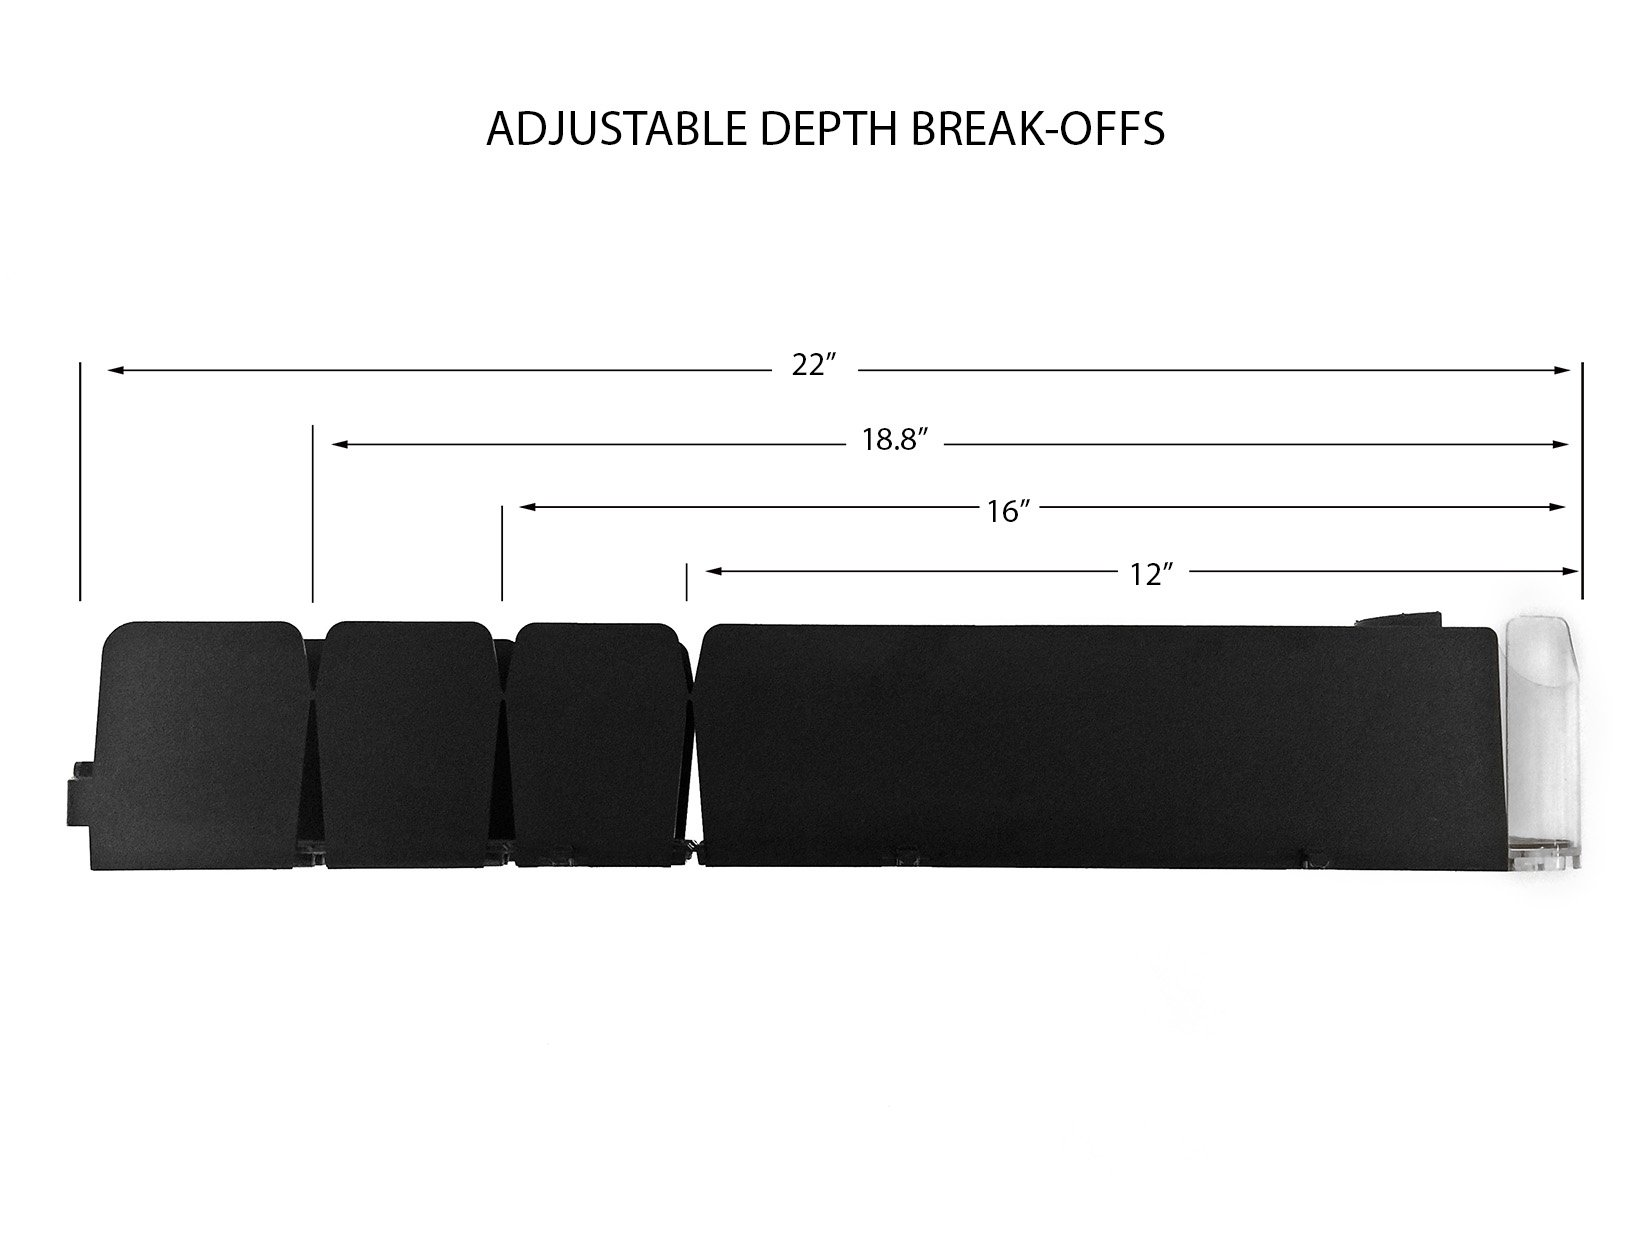 Display Technologies, LLC 12/16oz. Visi-FAST Pusher Glide - 1 Pack by Display Technologies, LLC (Image #7)